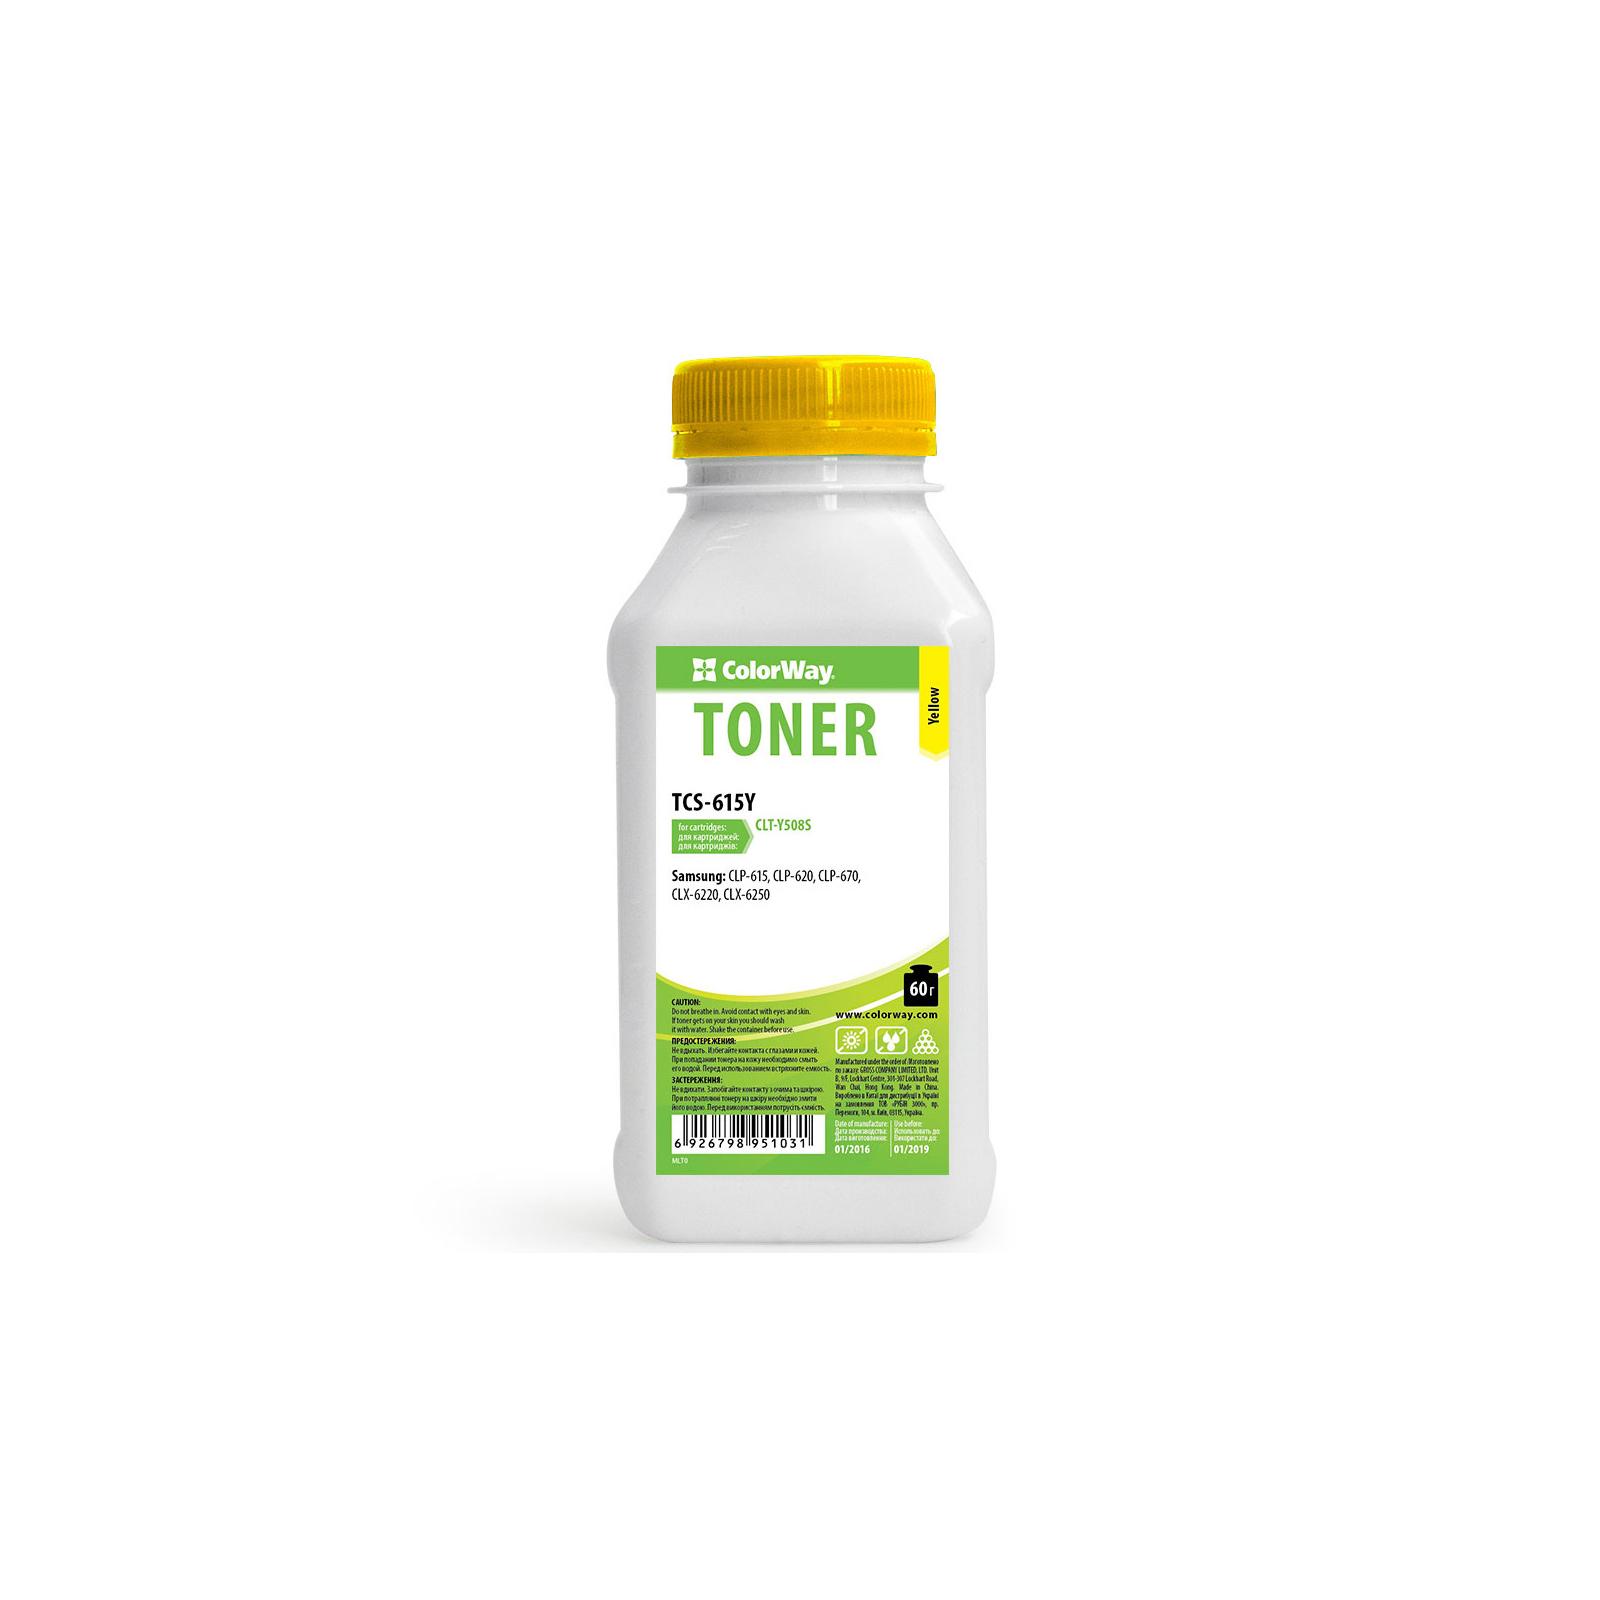 Тонер SAMSUNG CLP-615/620ND/670ND Yellow 60g ColorWay (TCS-615Y)